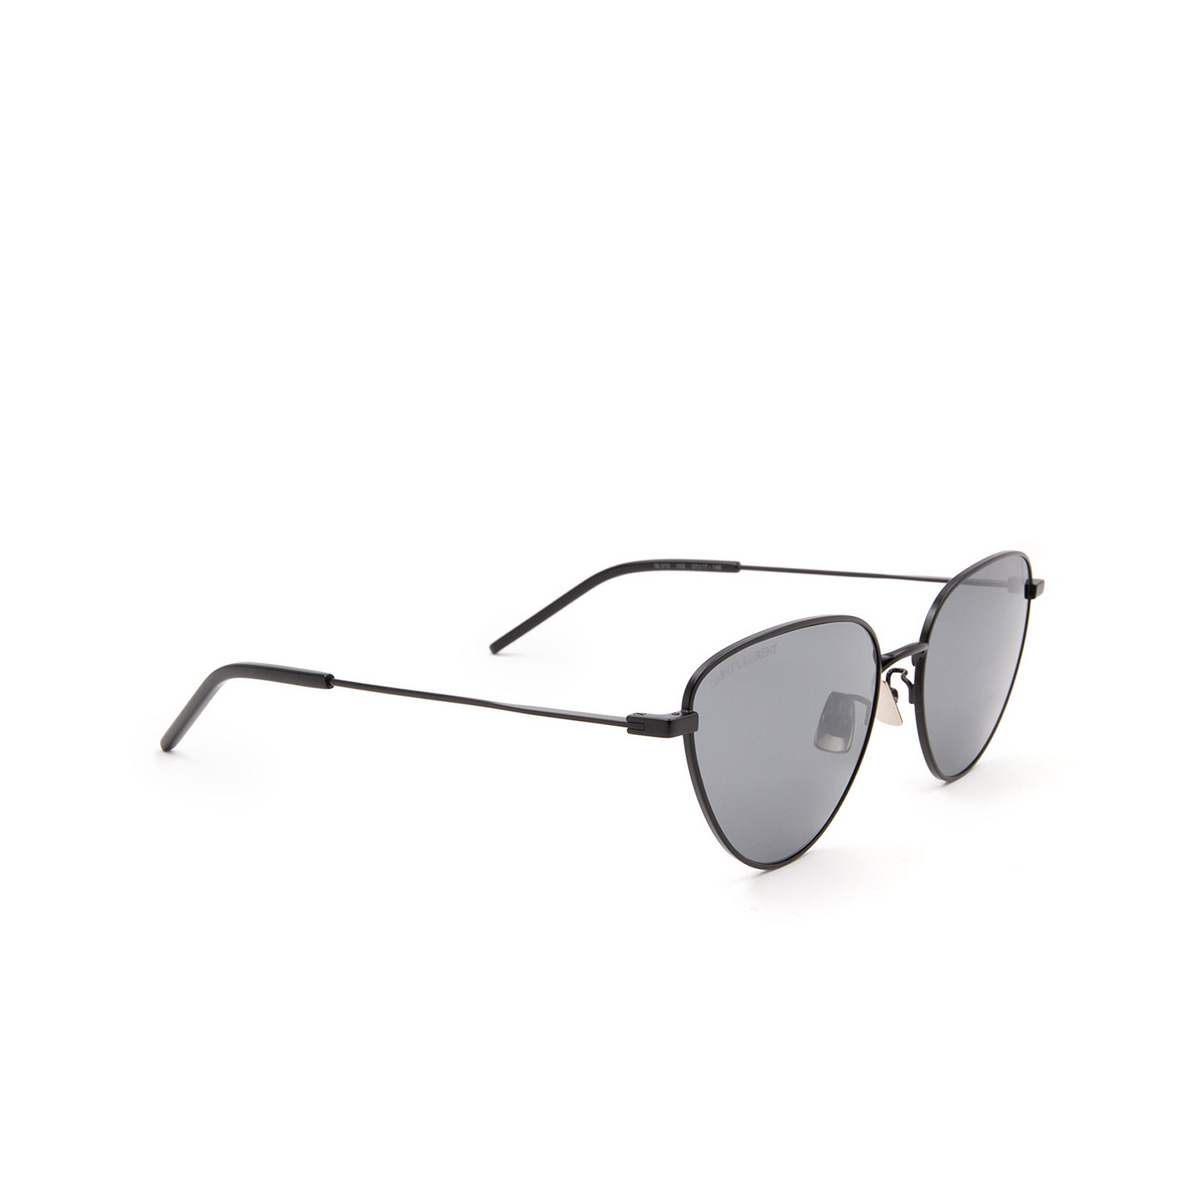 Saint Laurent® Irregular Sunglasses: SL 310 color Black 005 - 2/3.